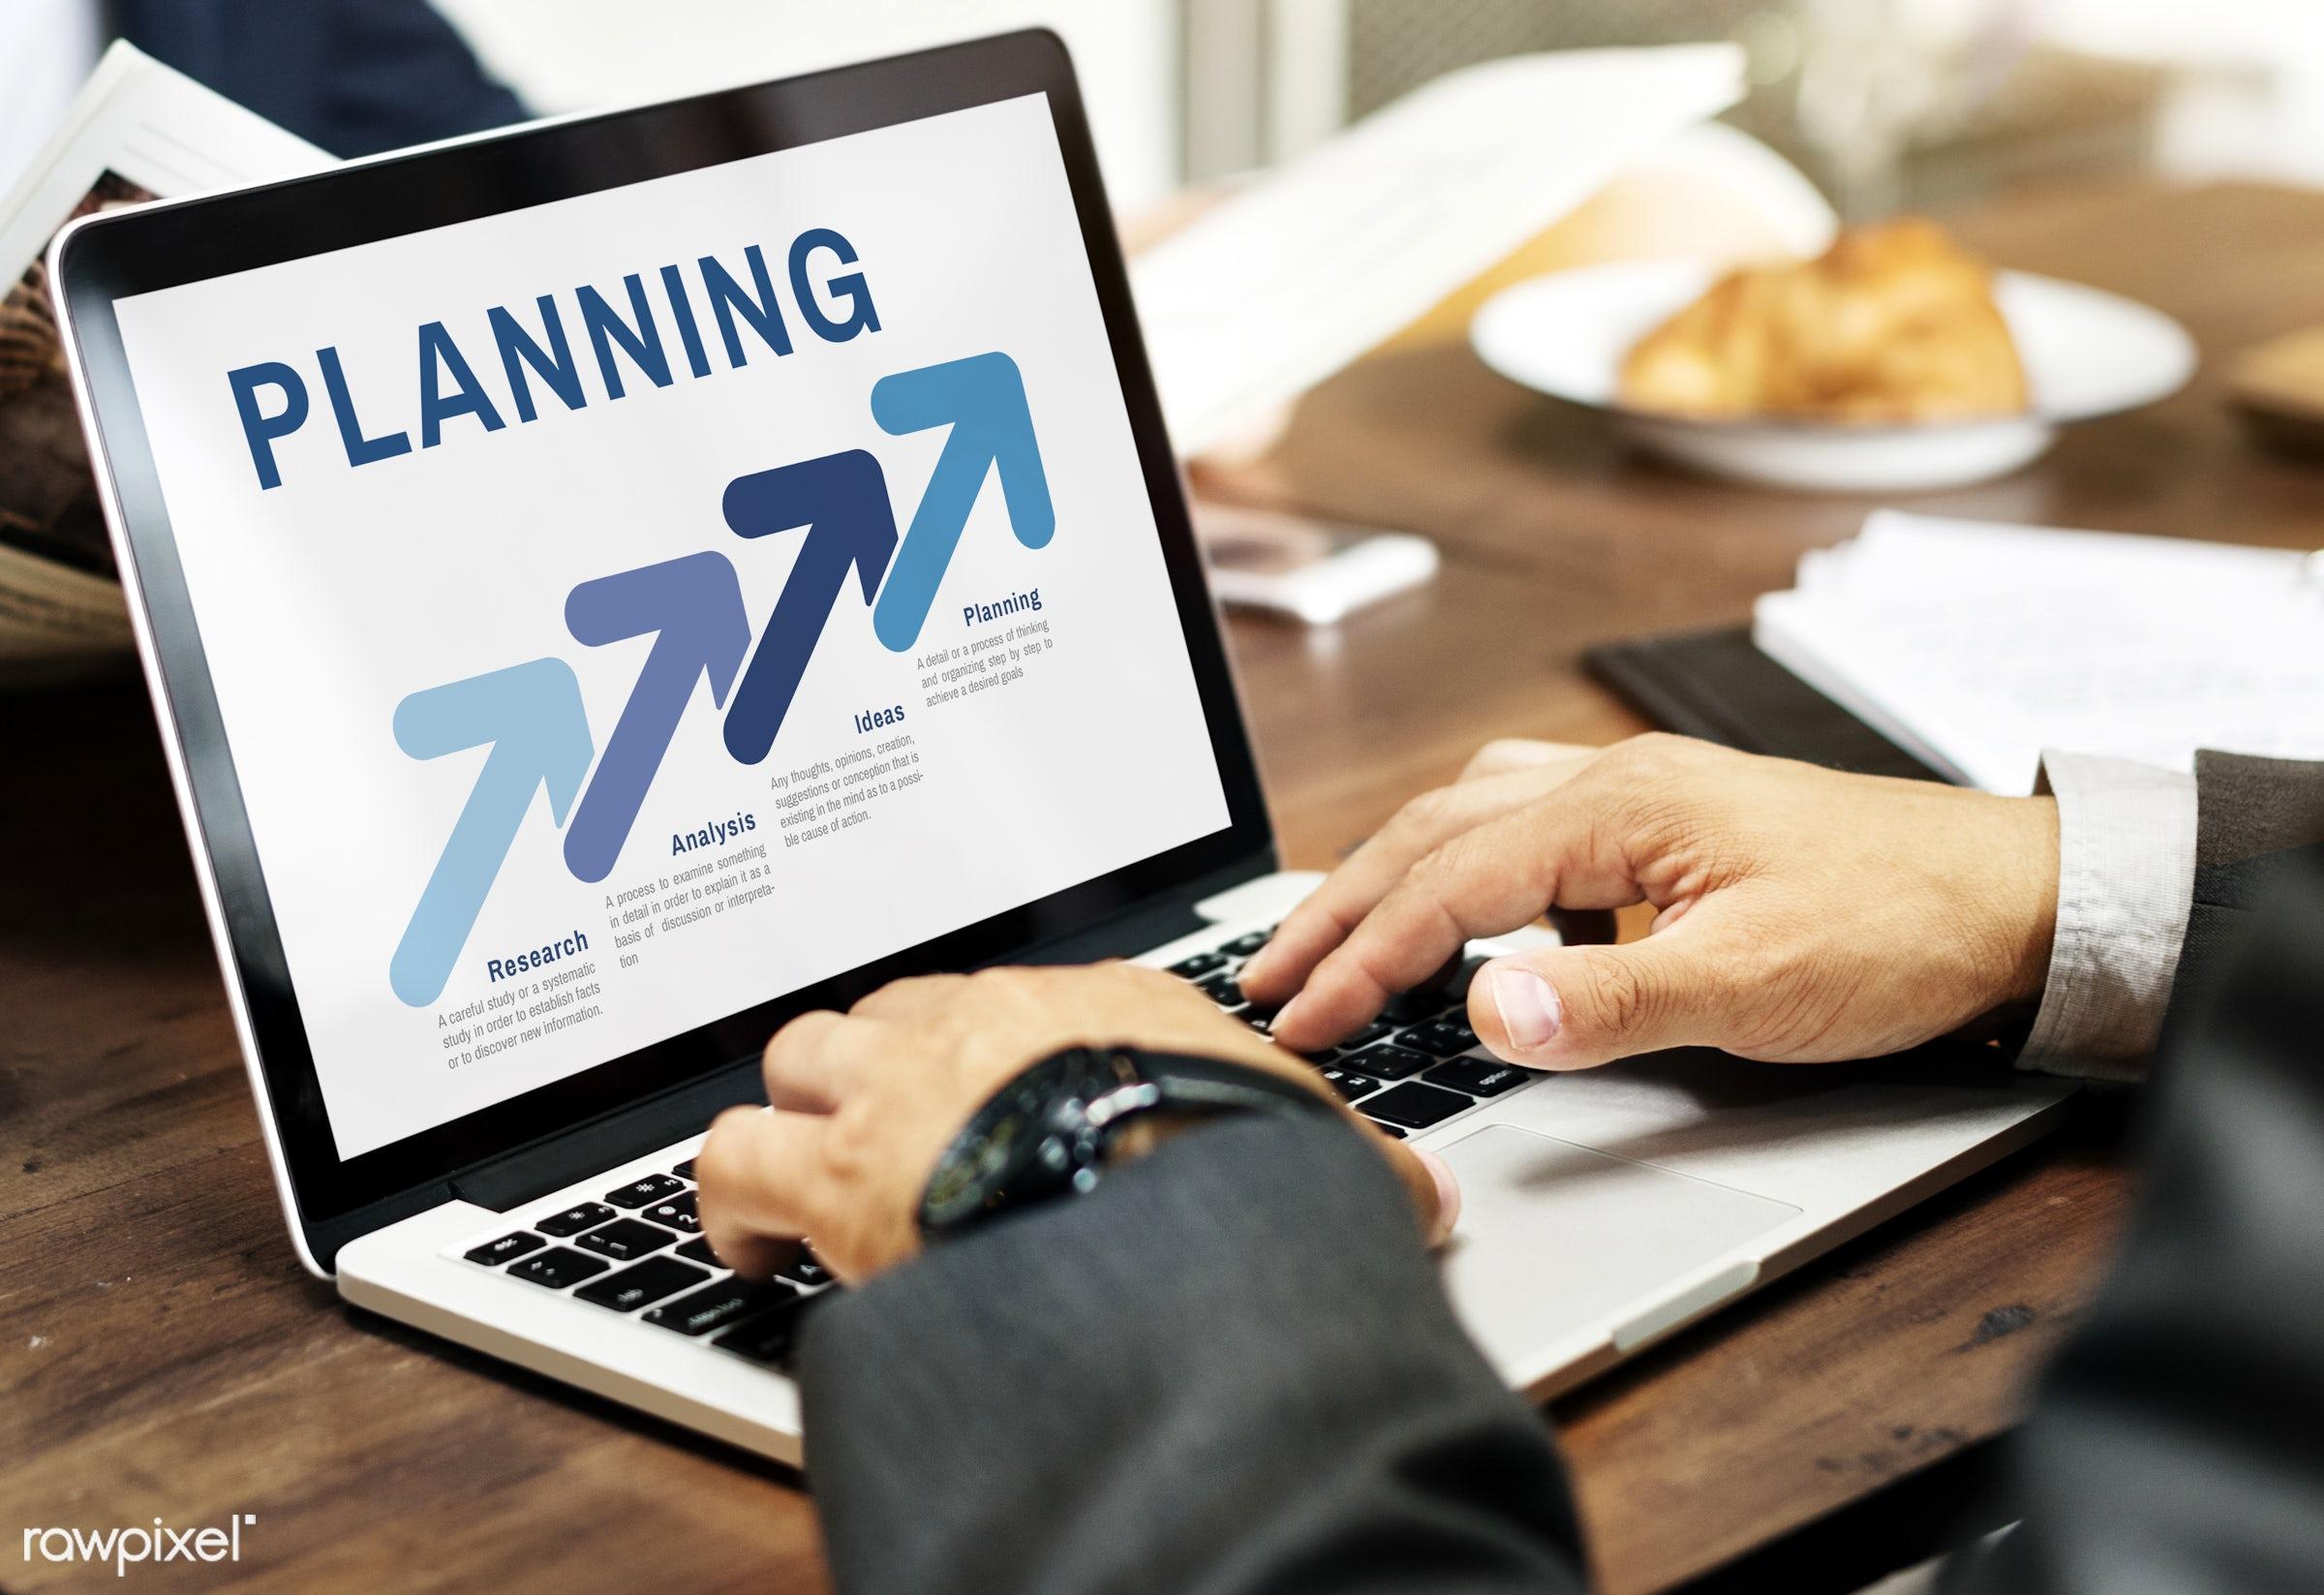 aim, analysing, analysis, arrow up, branding, browse, business, businessman, cafe, corporate, device, digital device,...